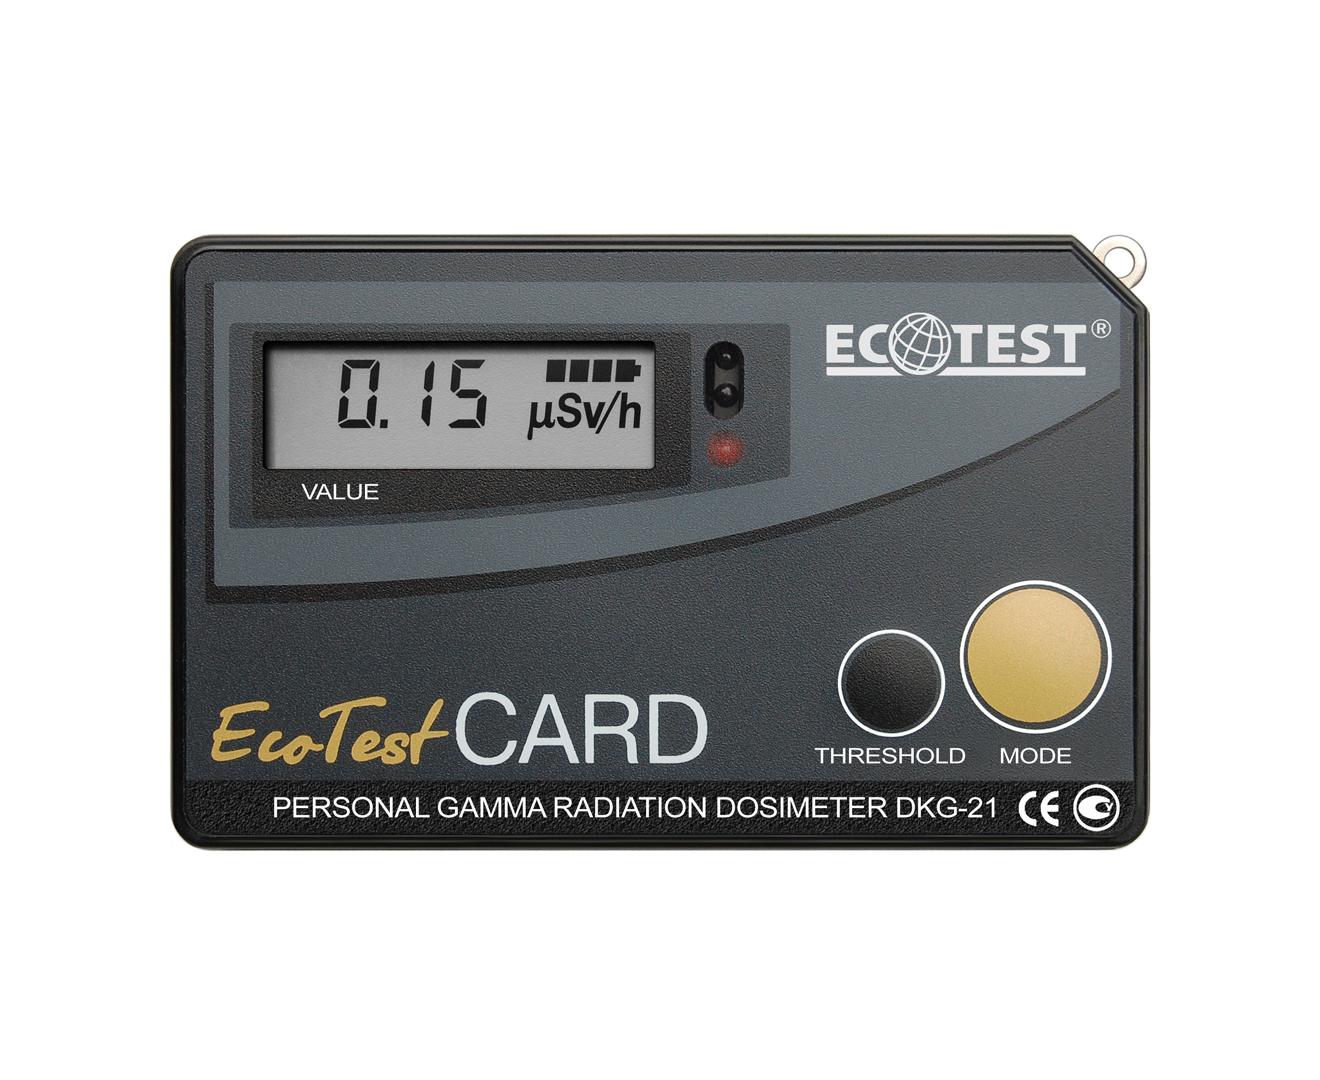 EcotestCARD